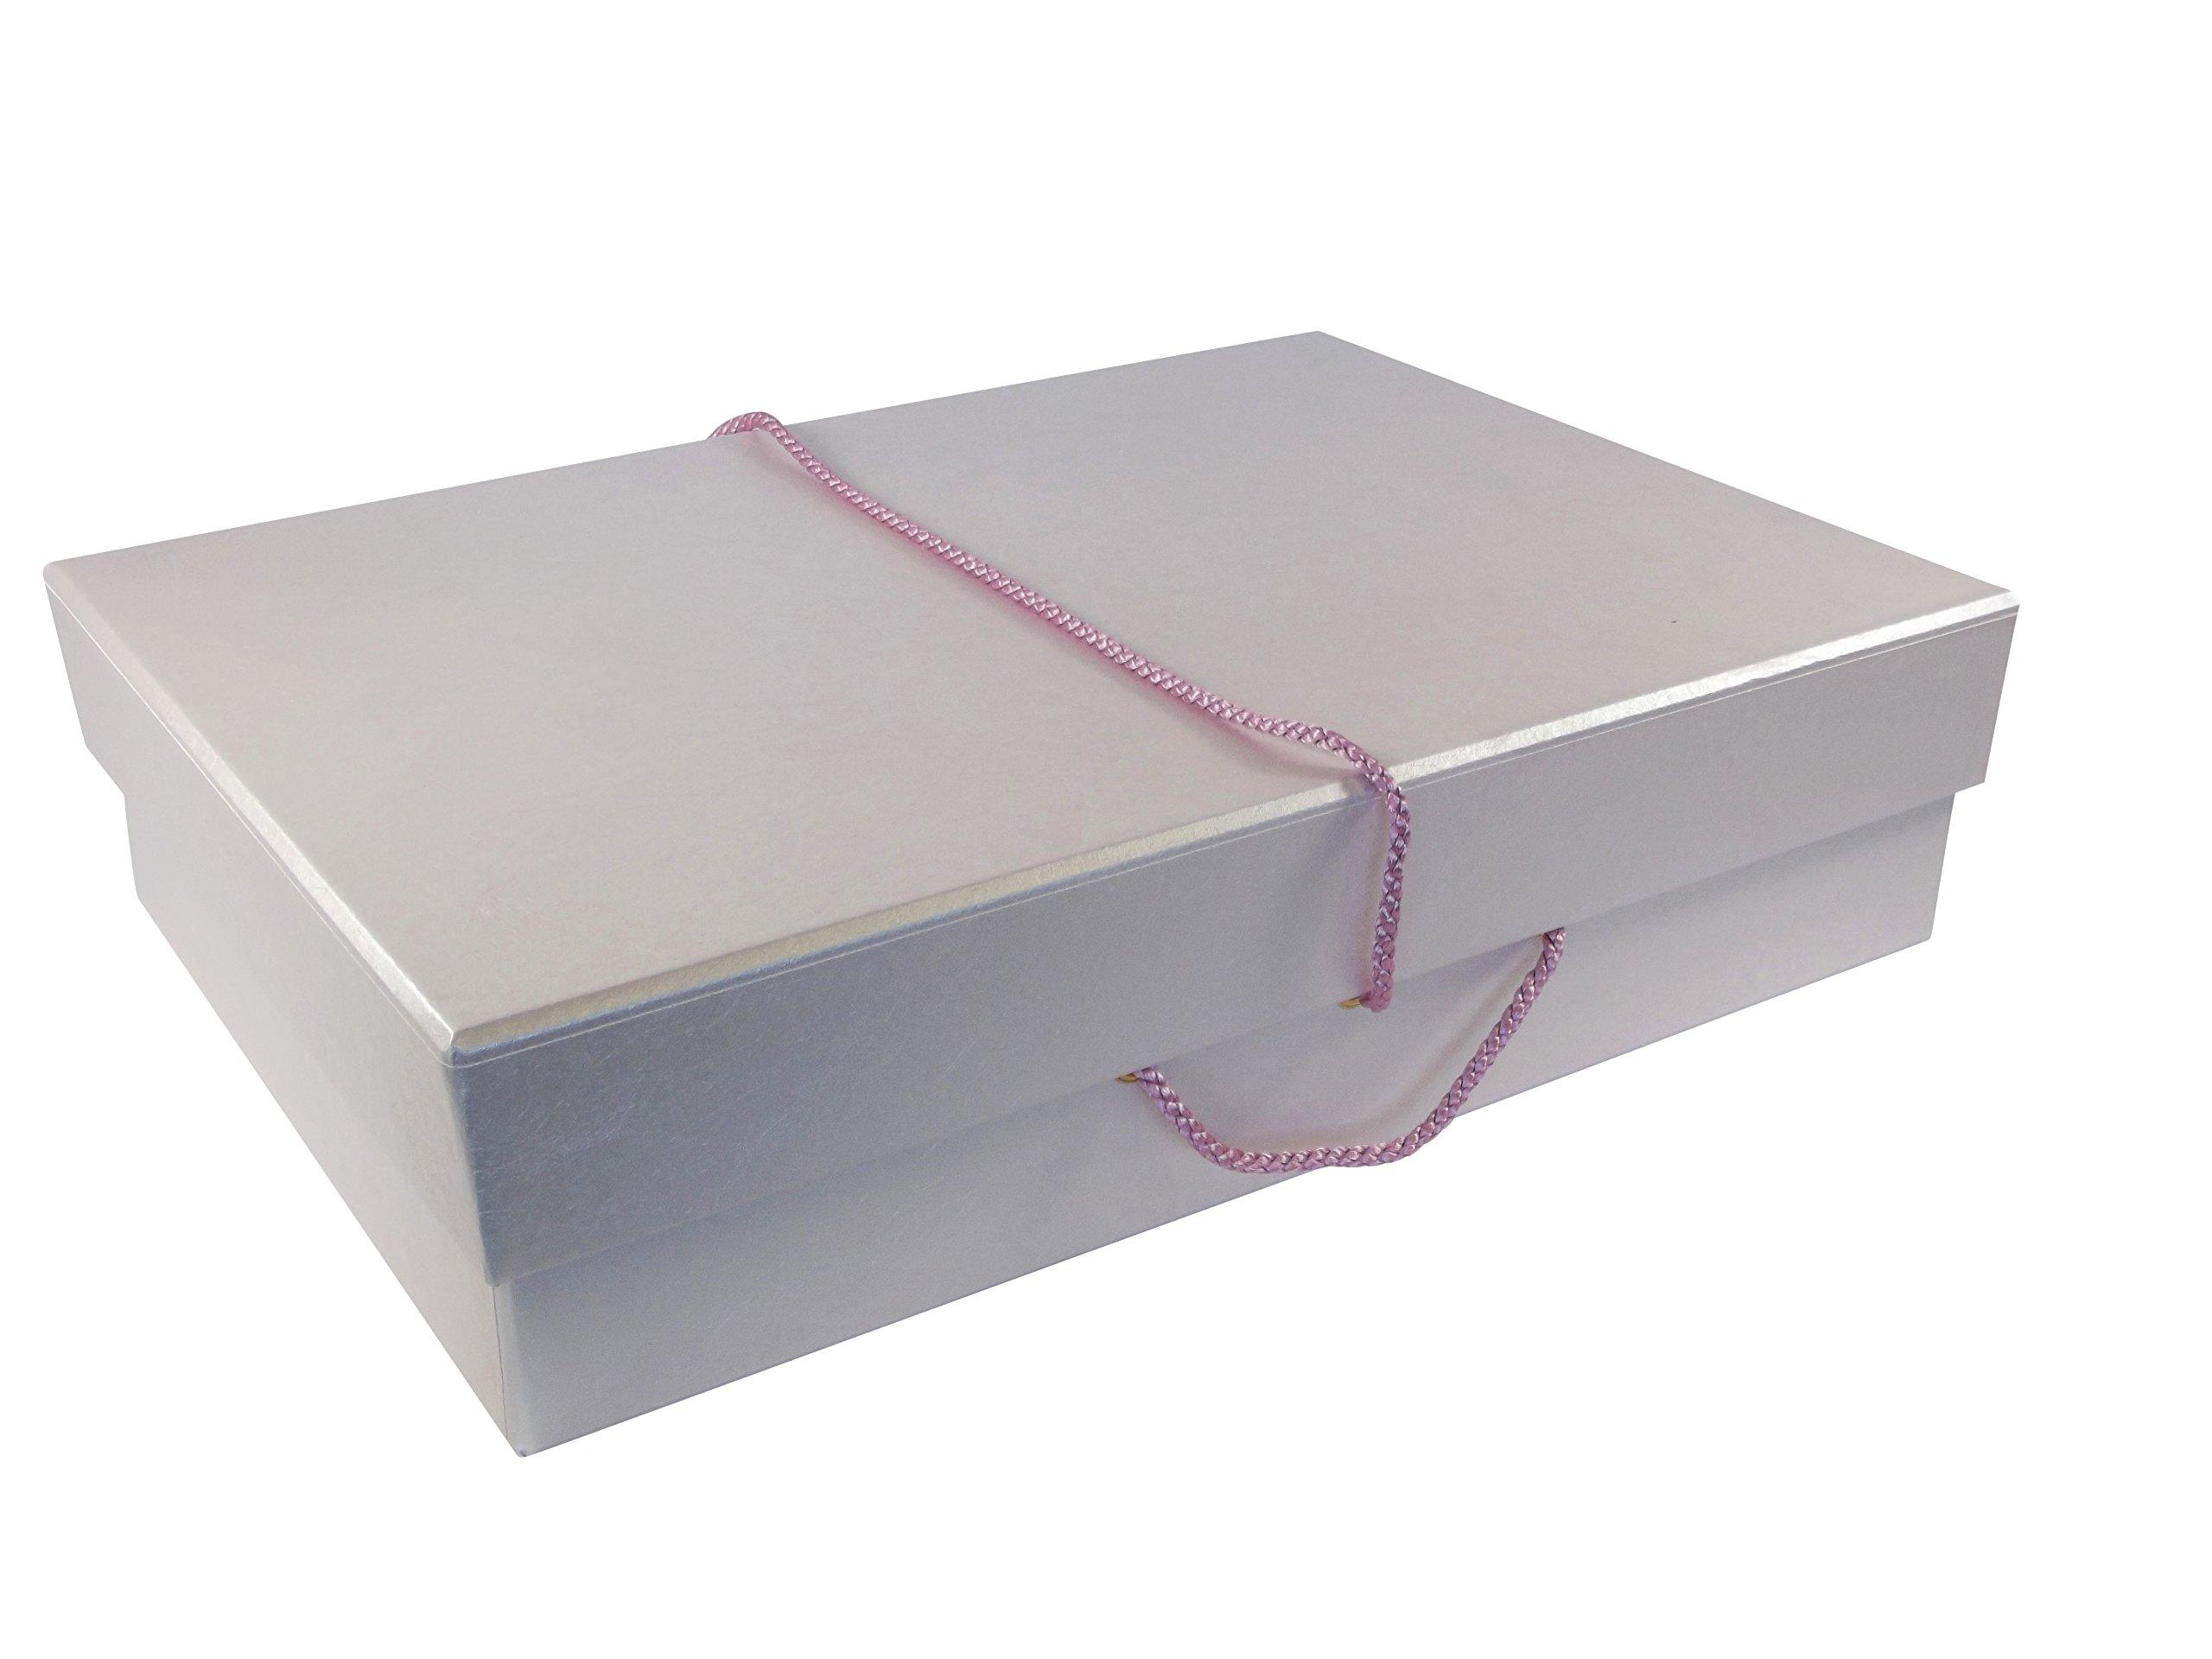 Colorful Wedding Dress Storage & Travel Box Quartz Pale Pink Medium by Foster-Stephens, inc